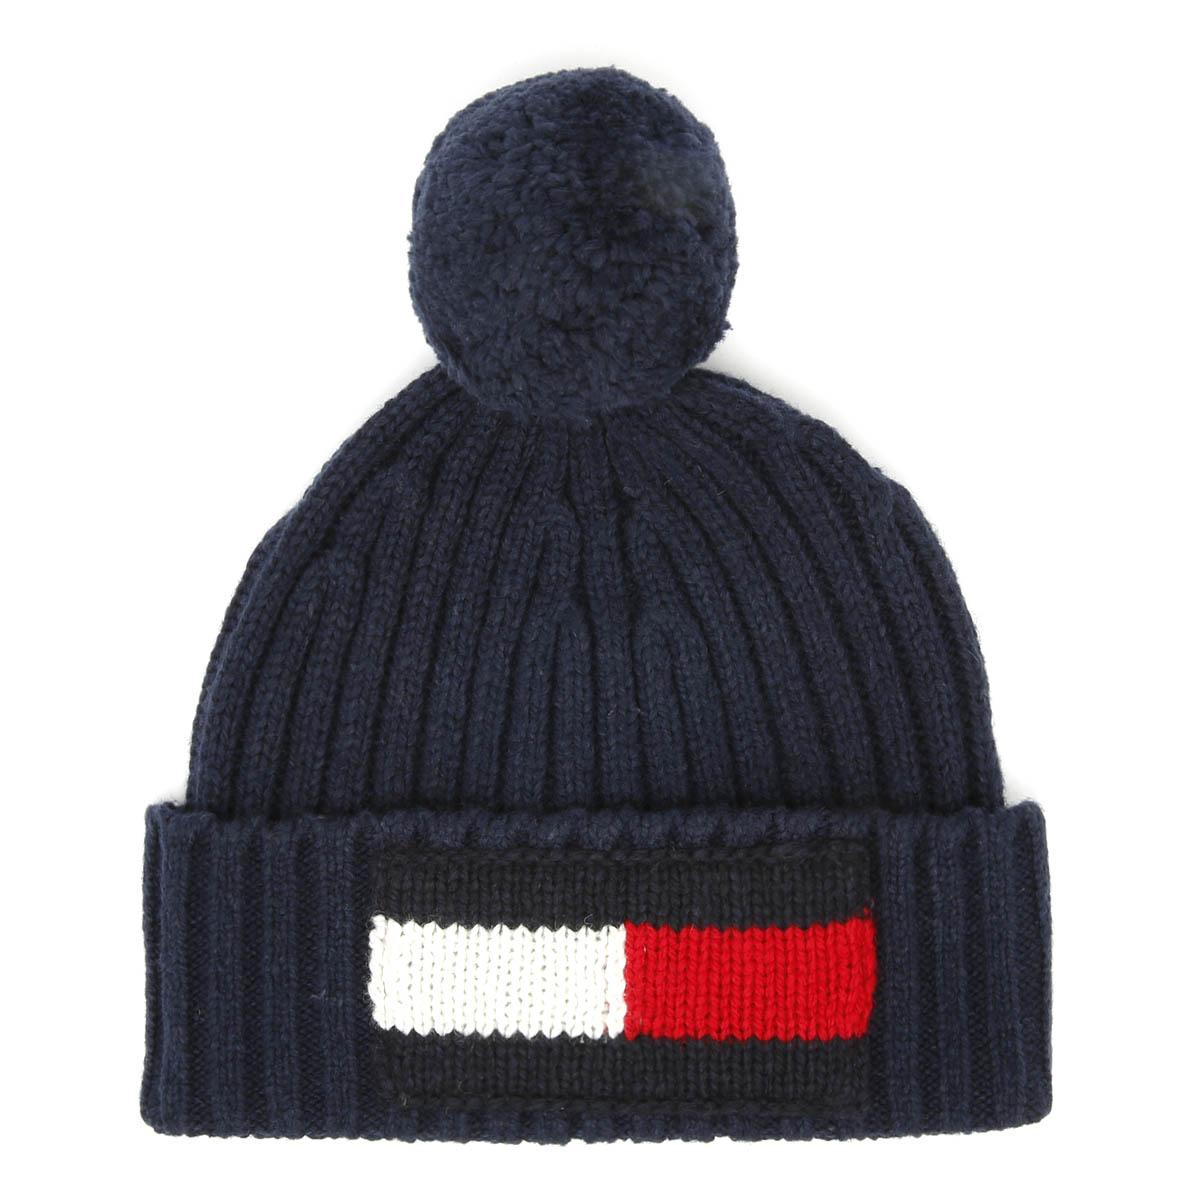 033f0c642dc Tommy Hilfiger Big Flag Navy Beanie Unisex Warm Winter Knitted Hat ...